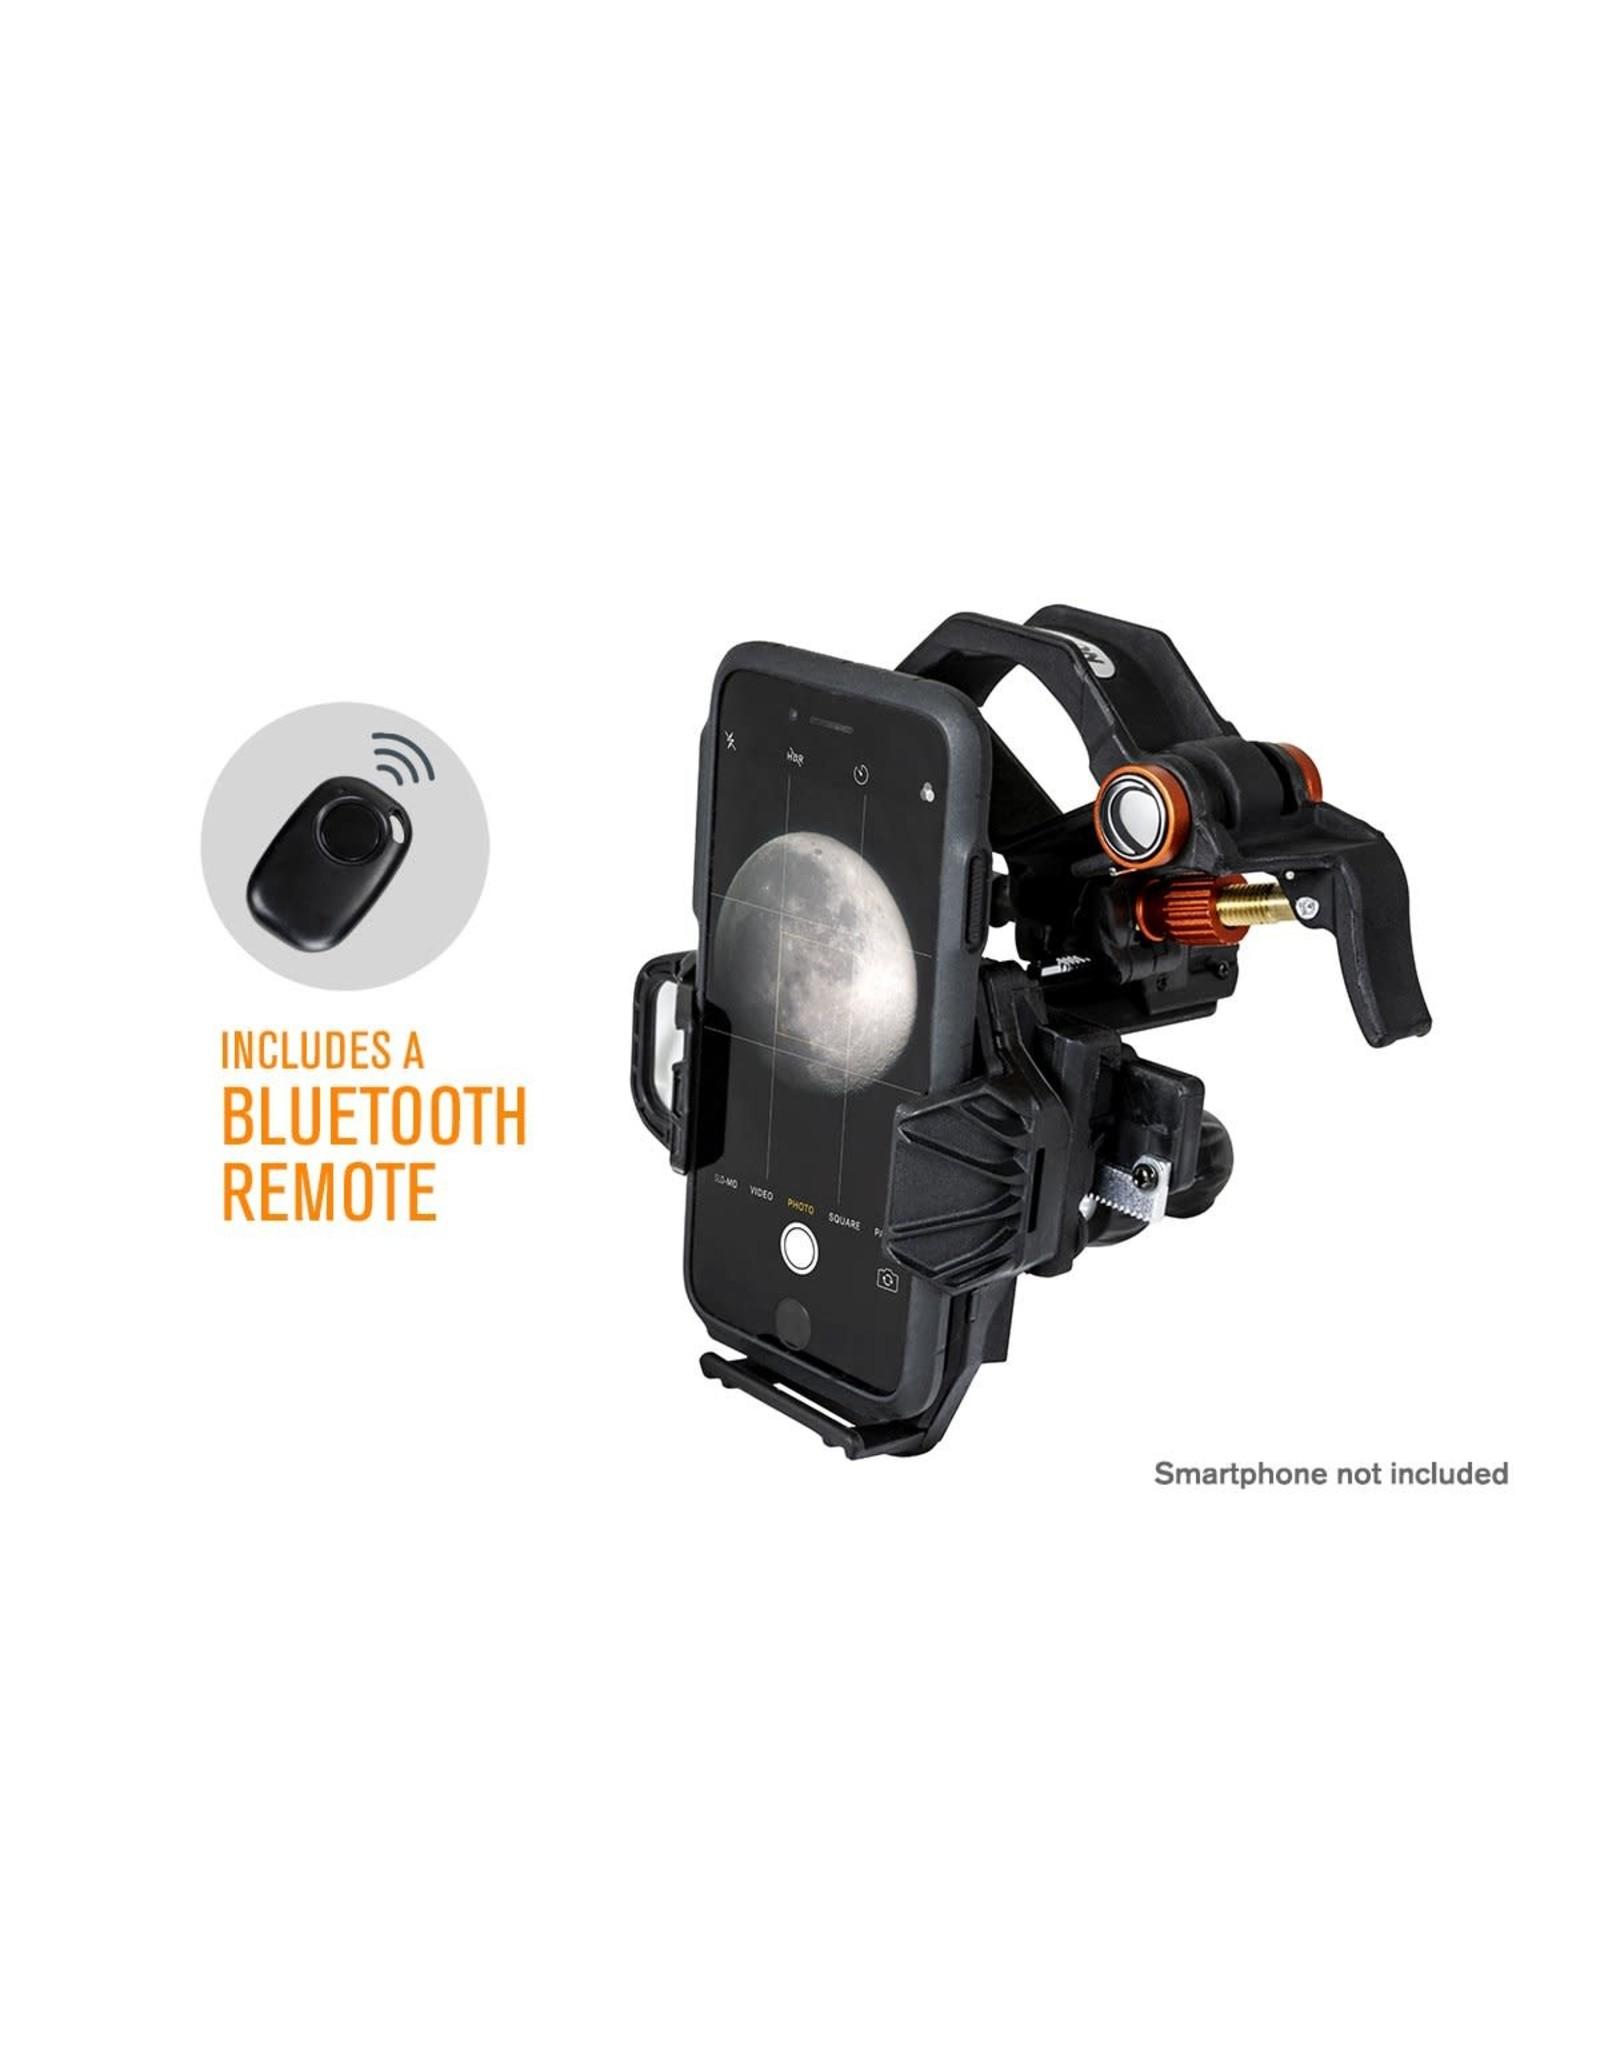 Celestron Celestron NEXYZ DX Kit with Bluetooth Remote - 81057